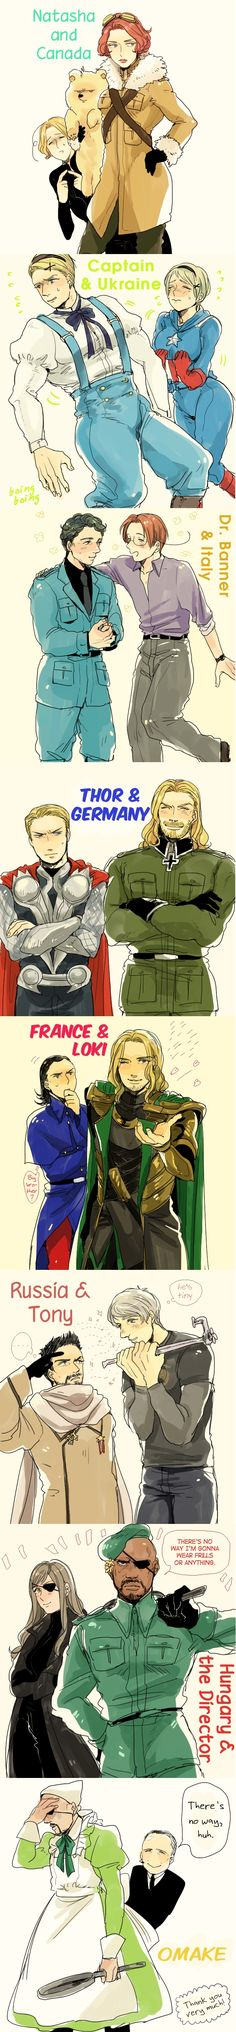 Hetalia and avengers kyaa